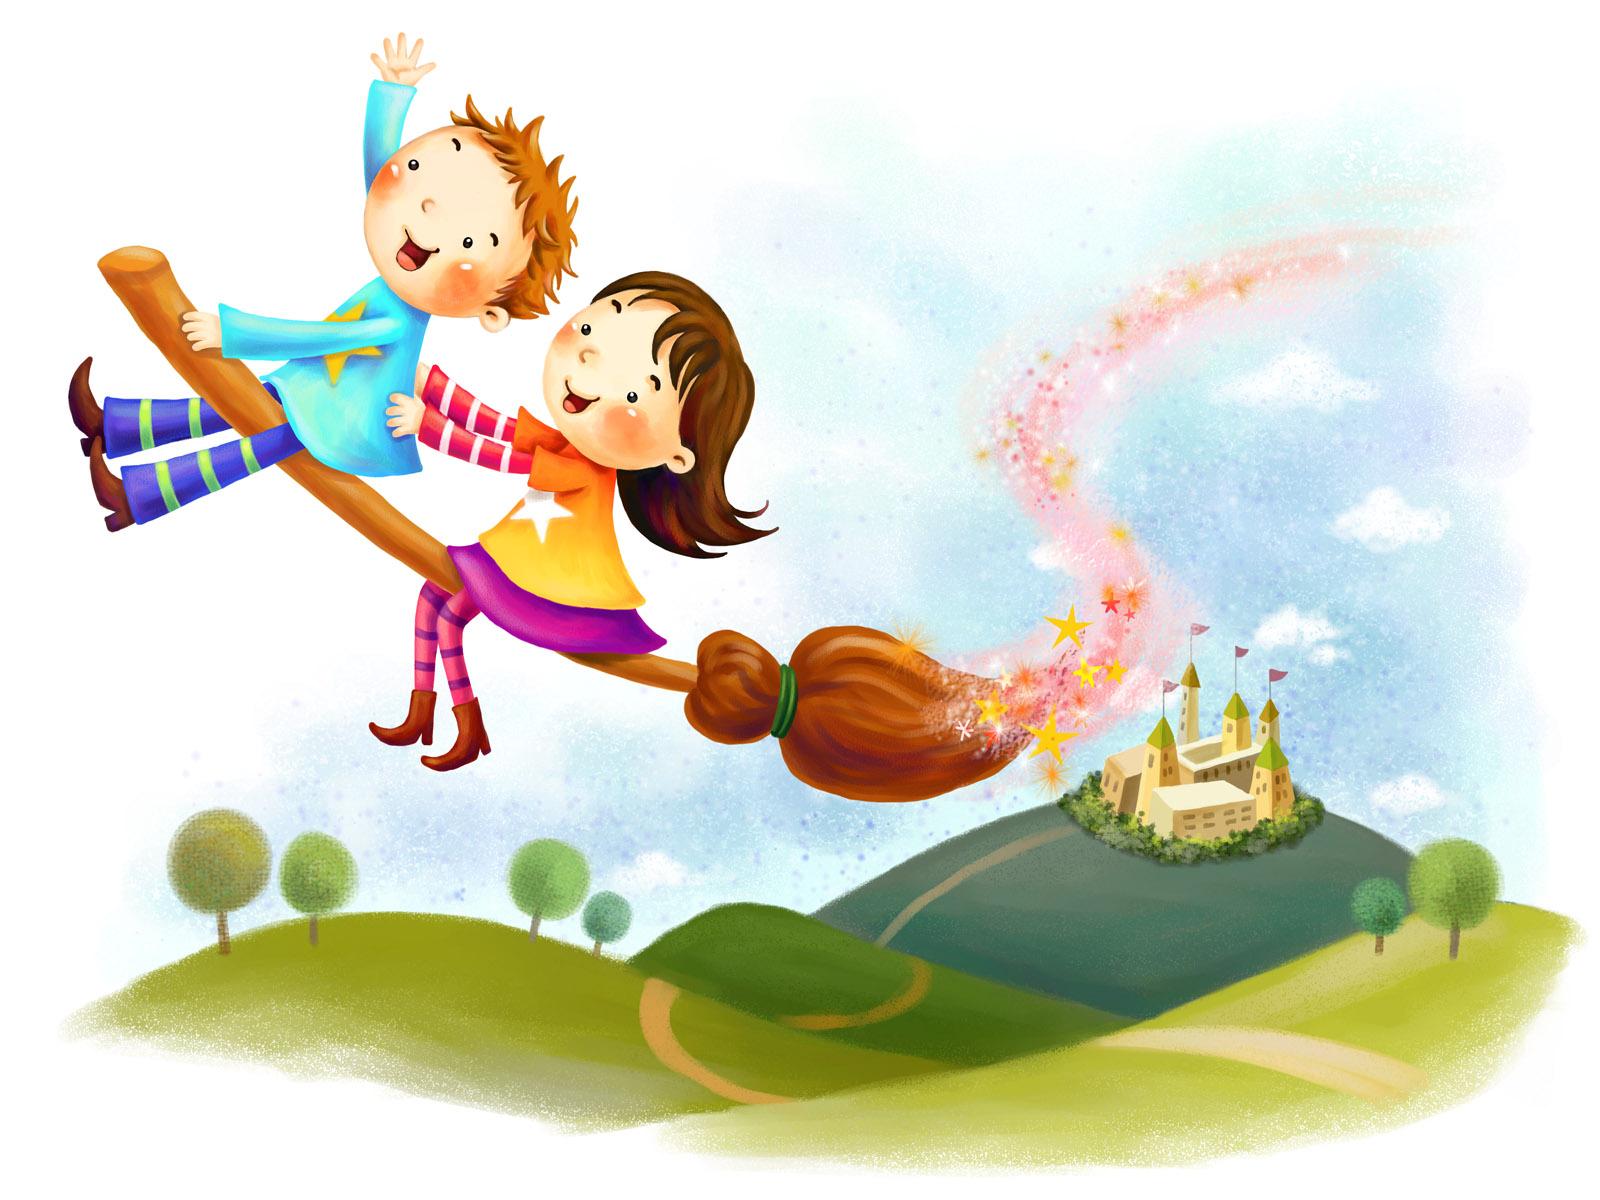 Cute Girl Cartoon Wallpaper Images Free Download 1600x1200